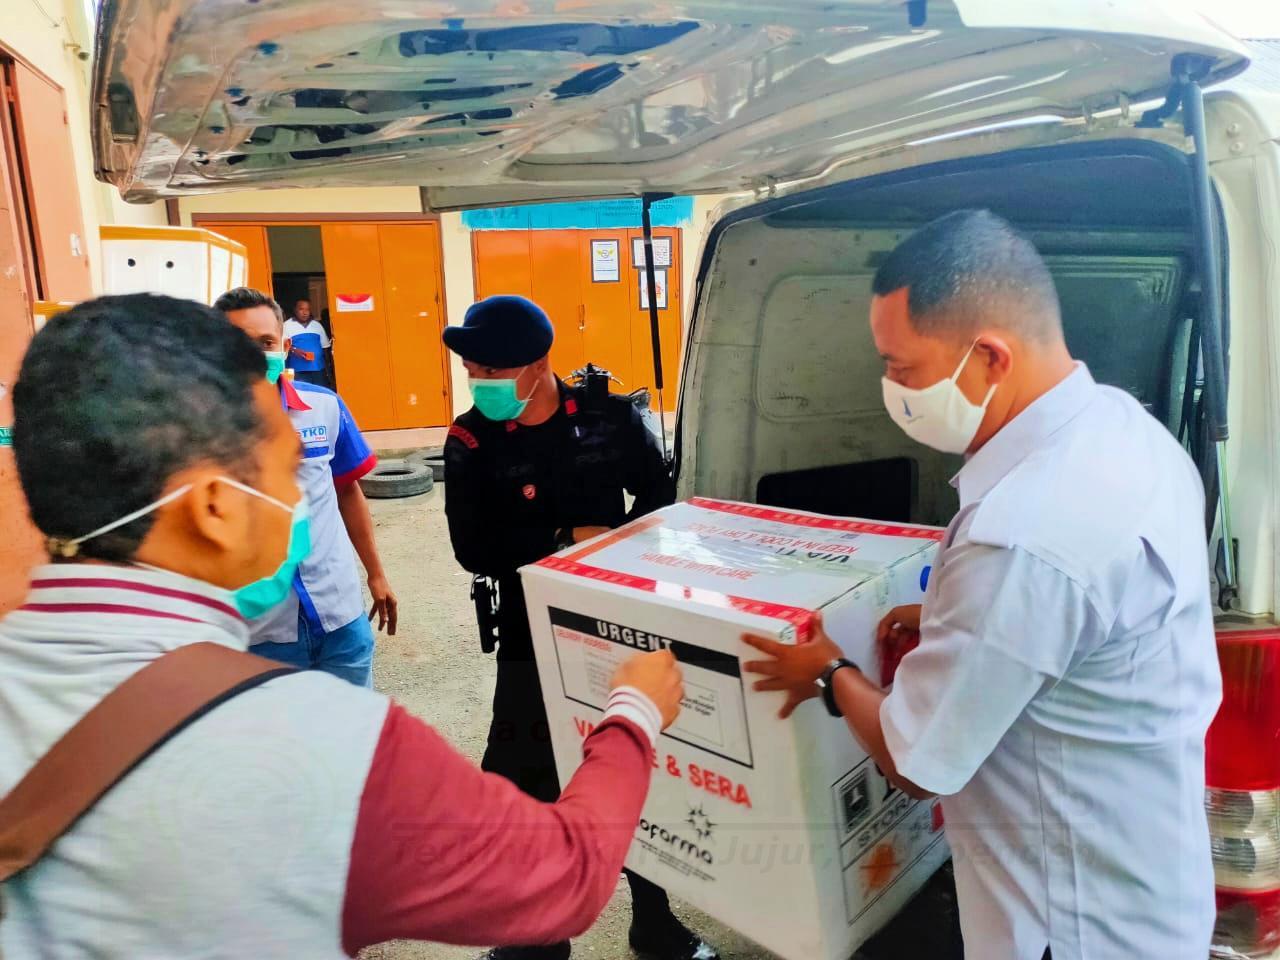 Tiba di Kota Sorong 2.600 Vaksin Sinovac Dikawal Langsung Batalyon B Pelopor dan Subden 2 Gegana 3 IMG 20210114 163600